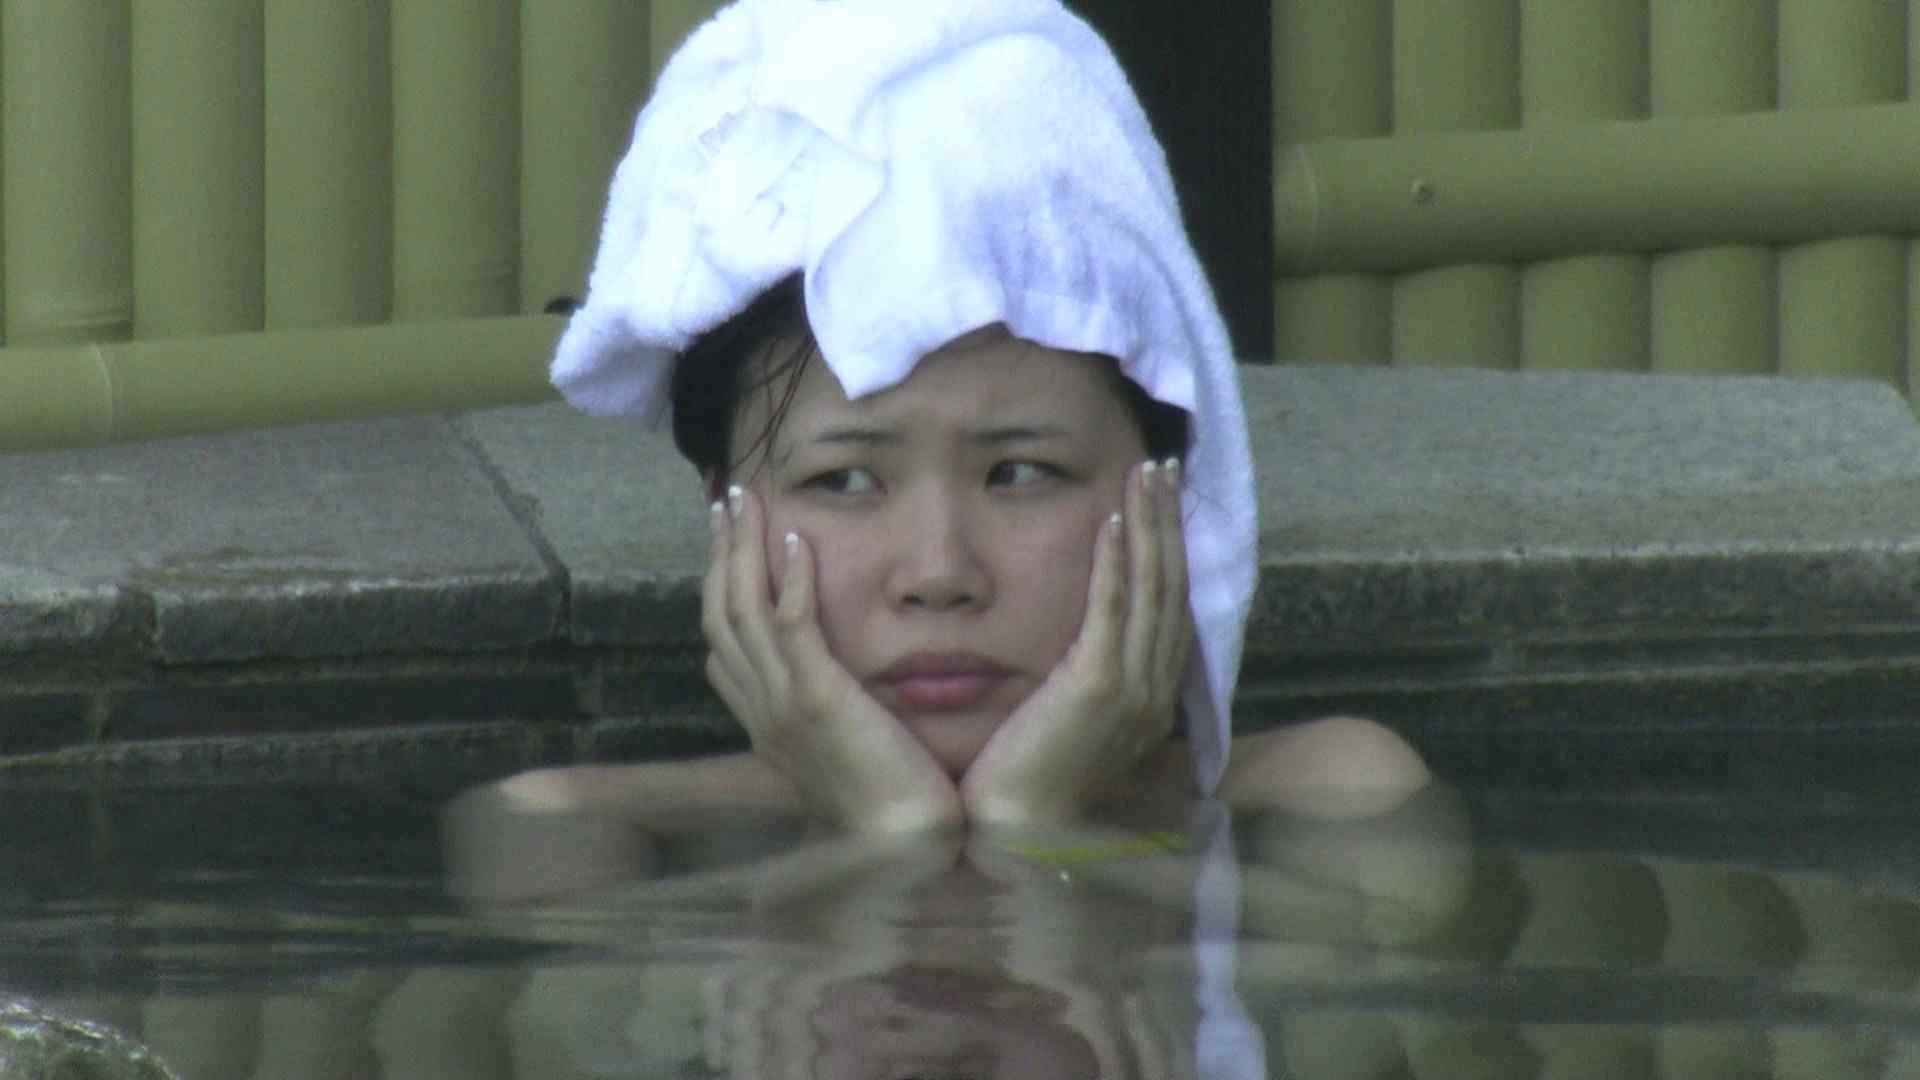 Aquaな露天風呂Vol.183 露天 濡れ場動画紹介 106pic 104